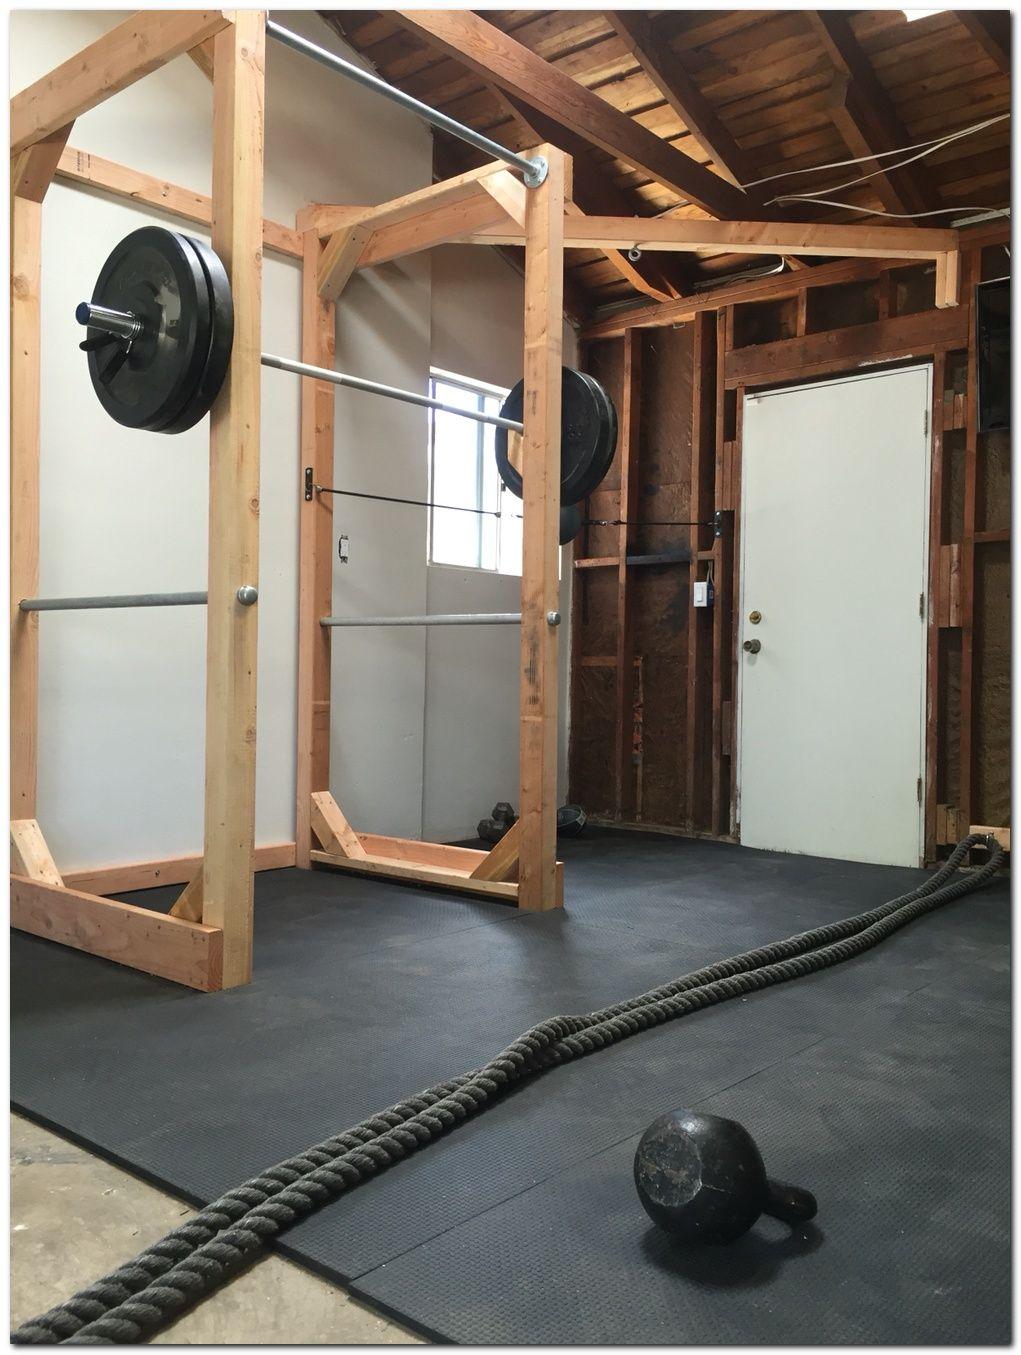 Best home gym setup ideas you can easily build home inspiration